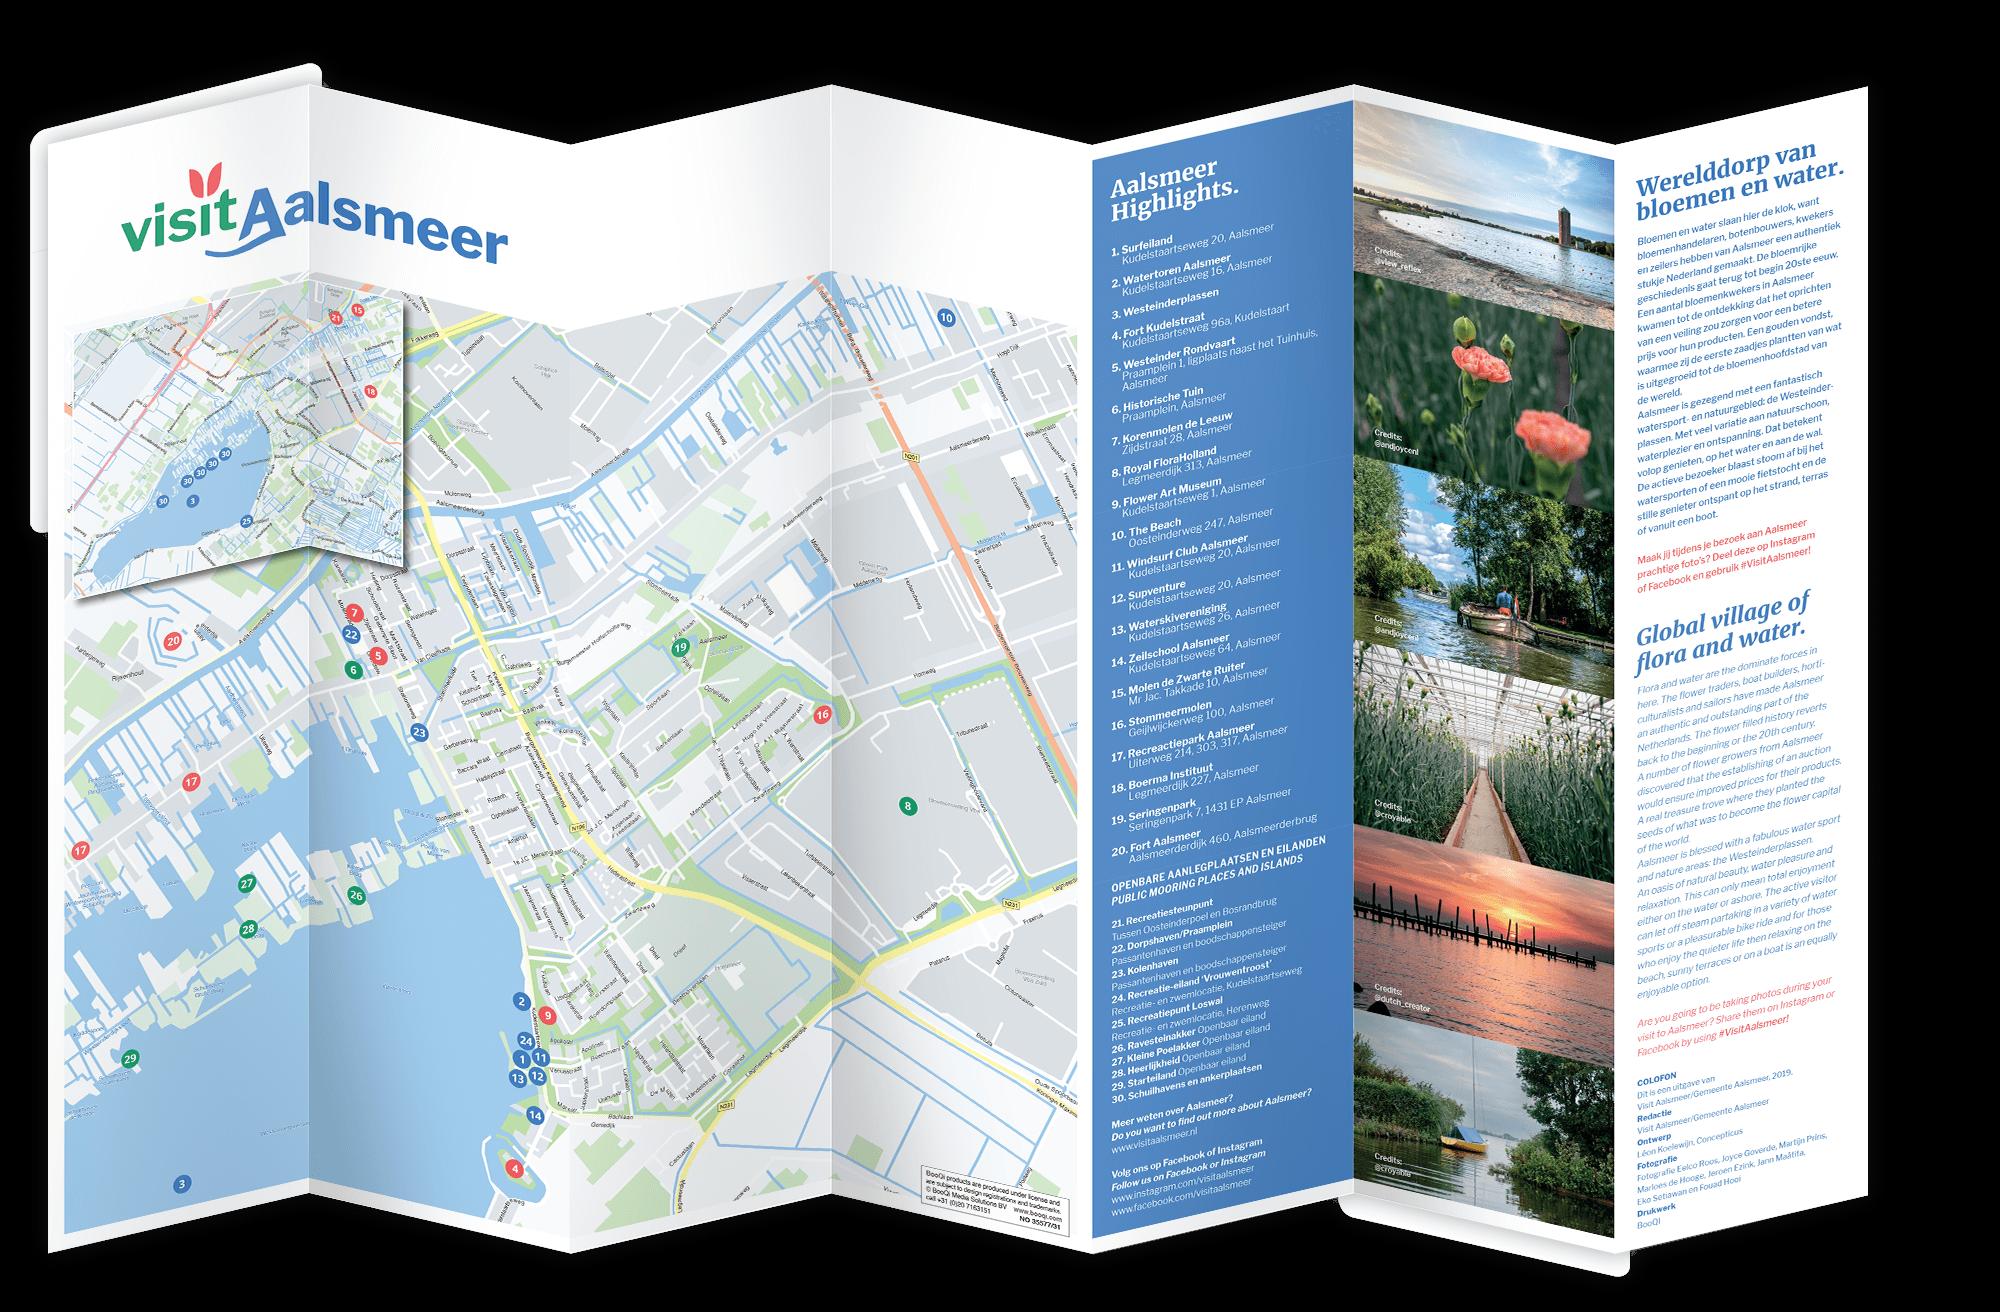 Plattegrond van Visit Aalsmeer